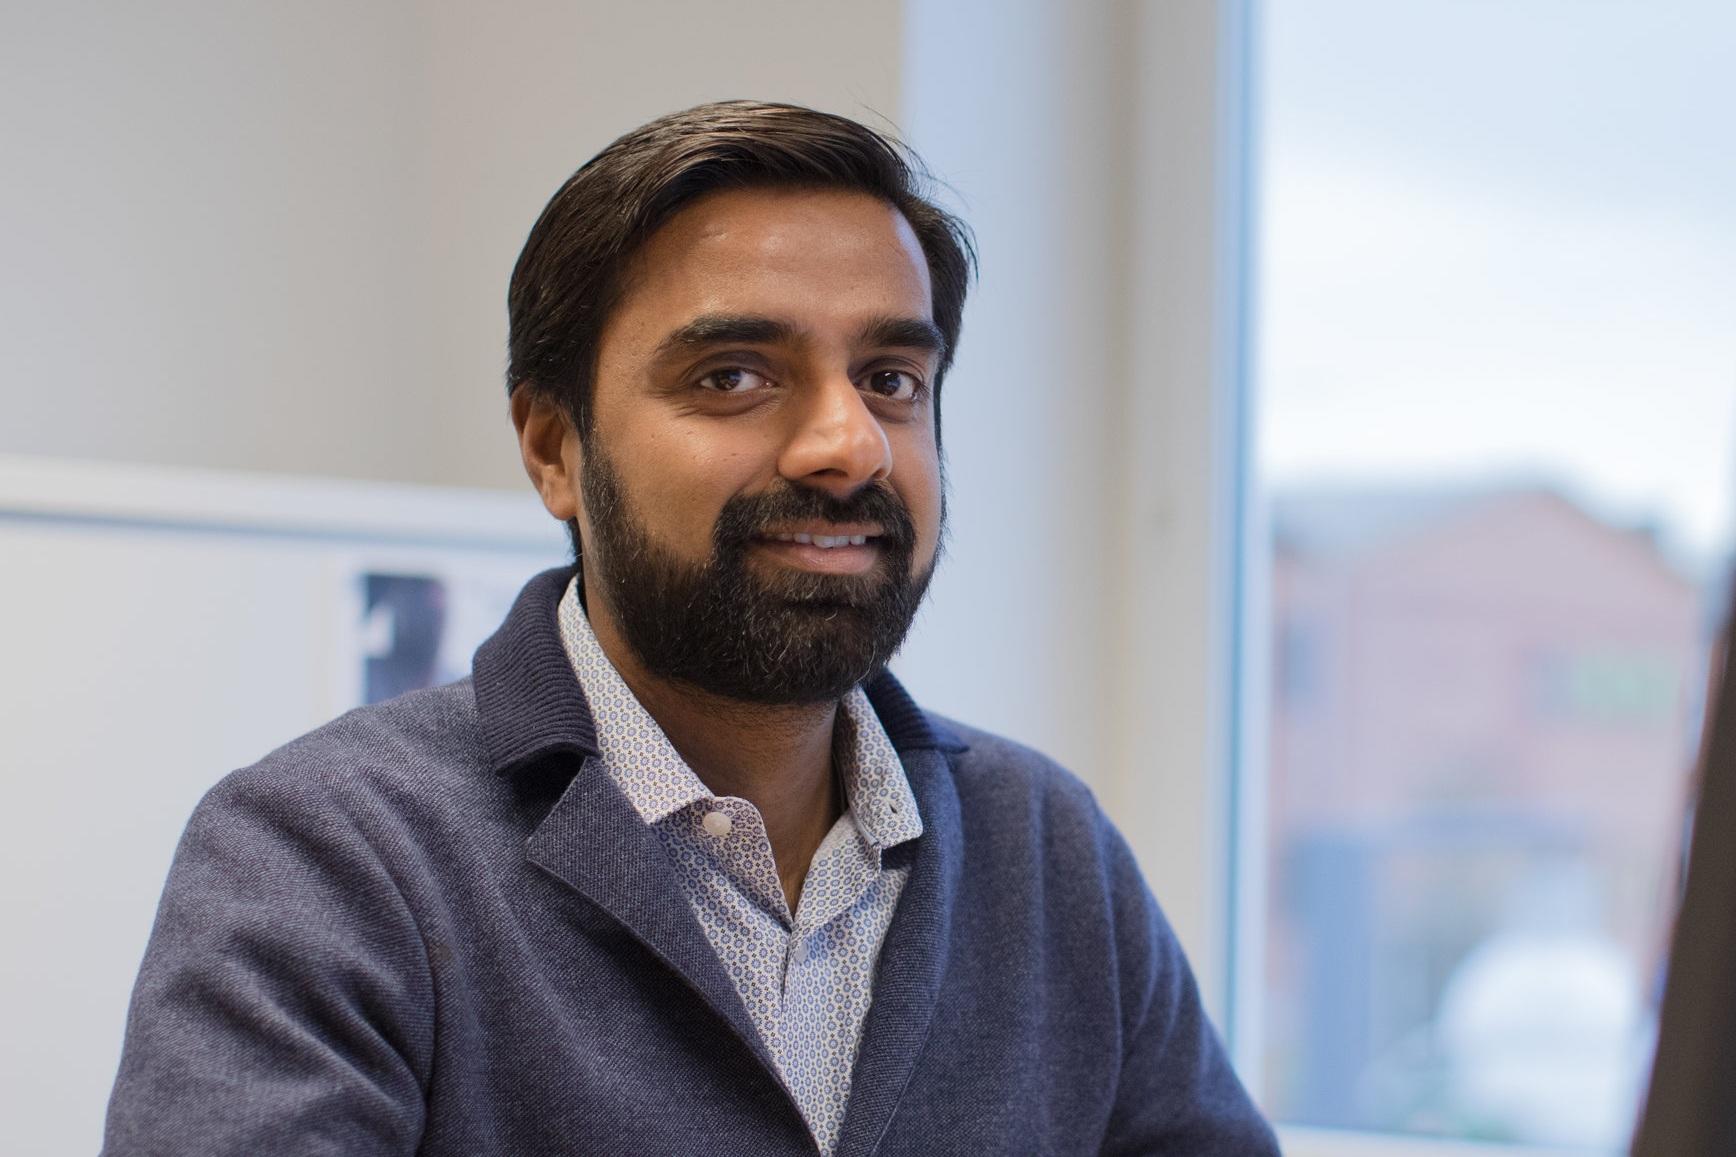 Vivek Menon, Head of Department in SEA HEALTH & WELFARE